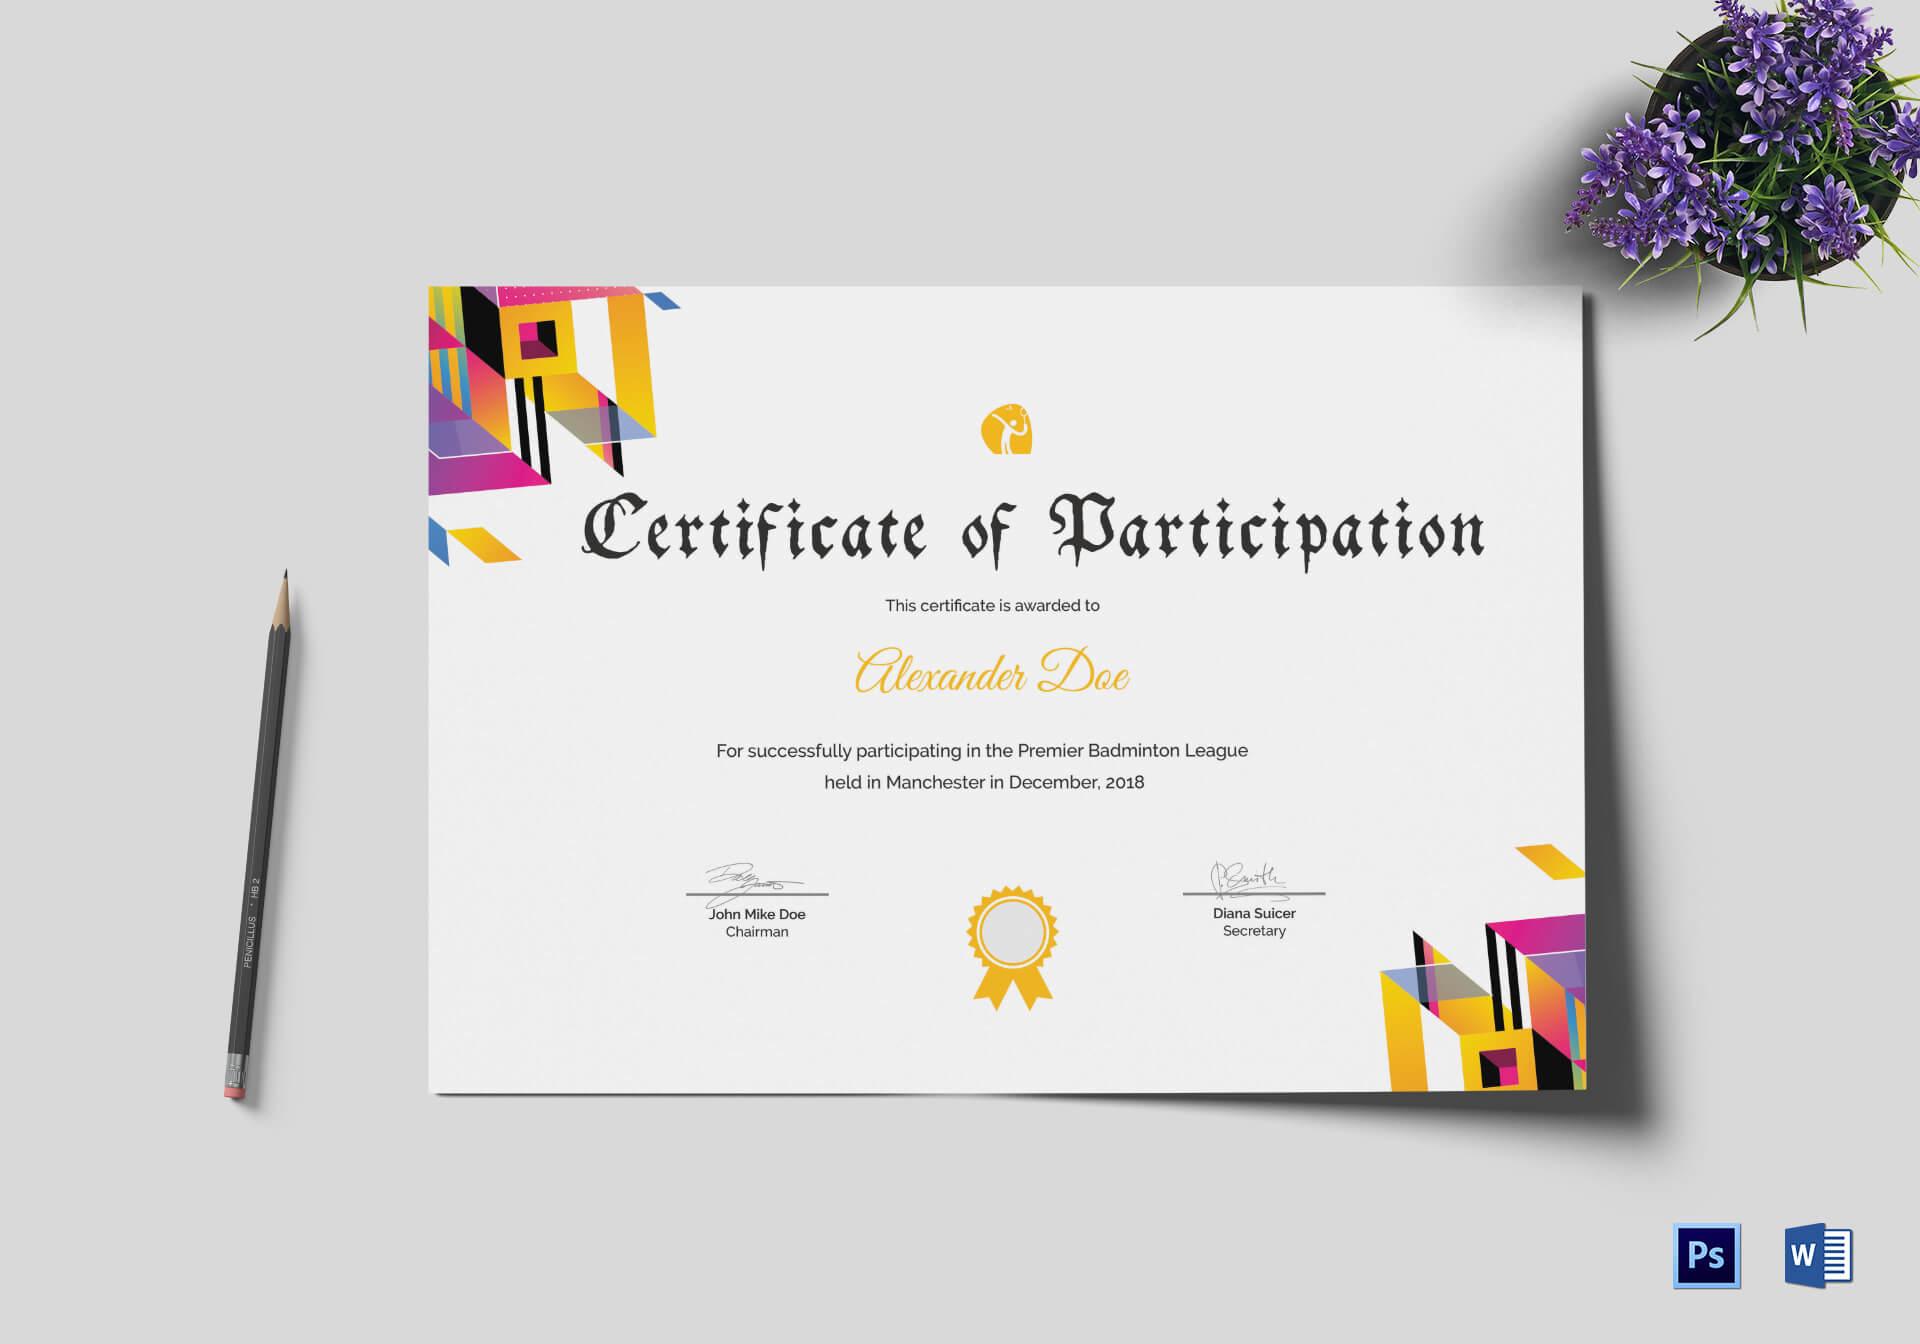 Badminton Participation Certificate Template inside Templates For Certificates Of Participation